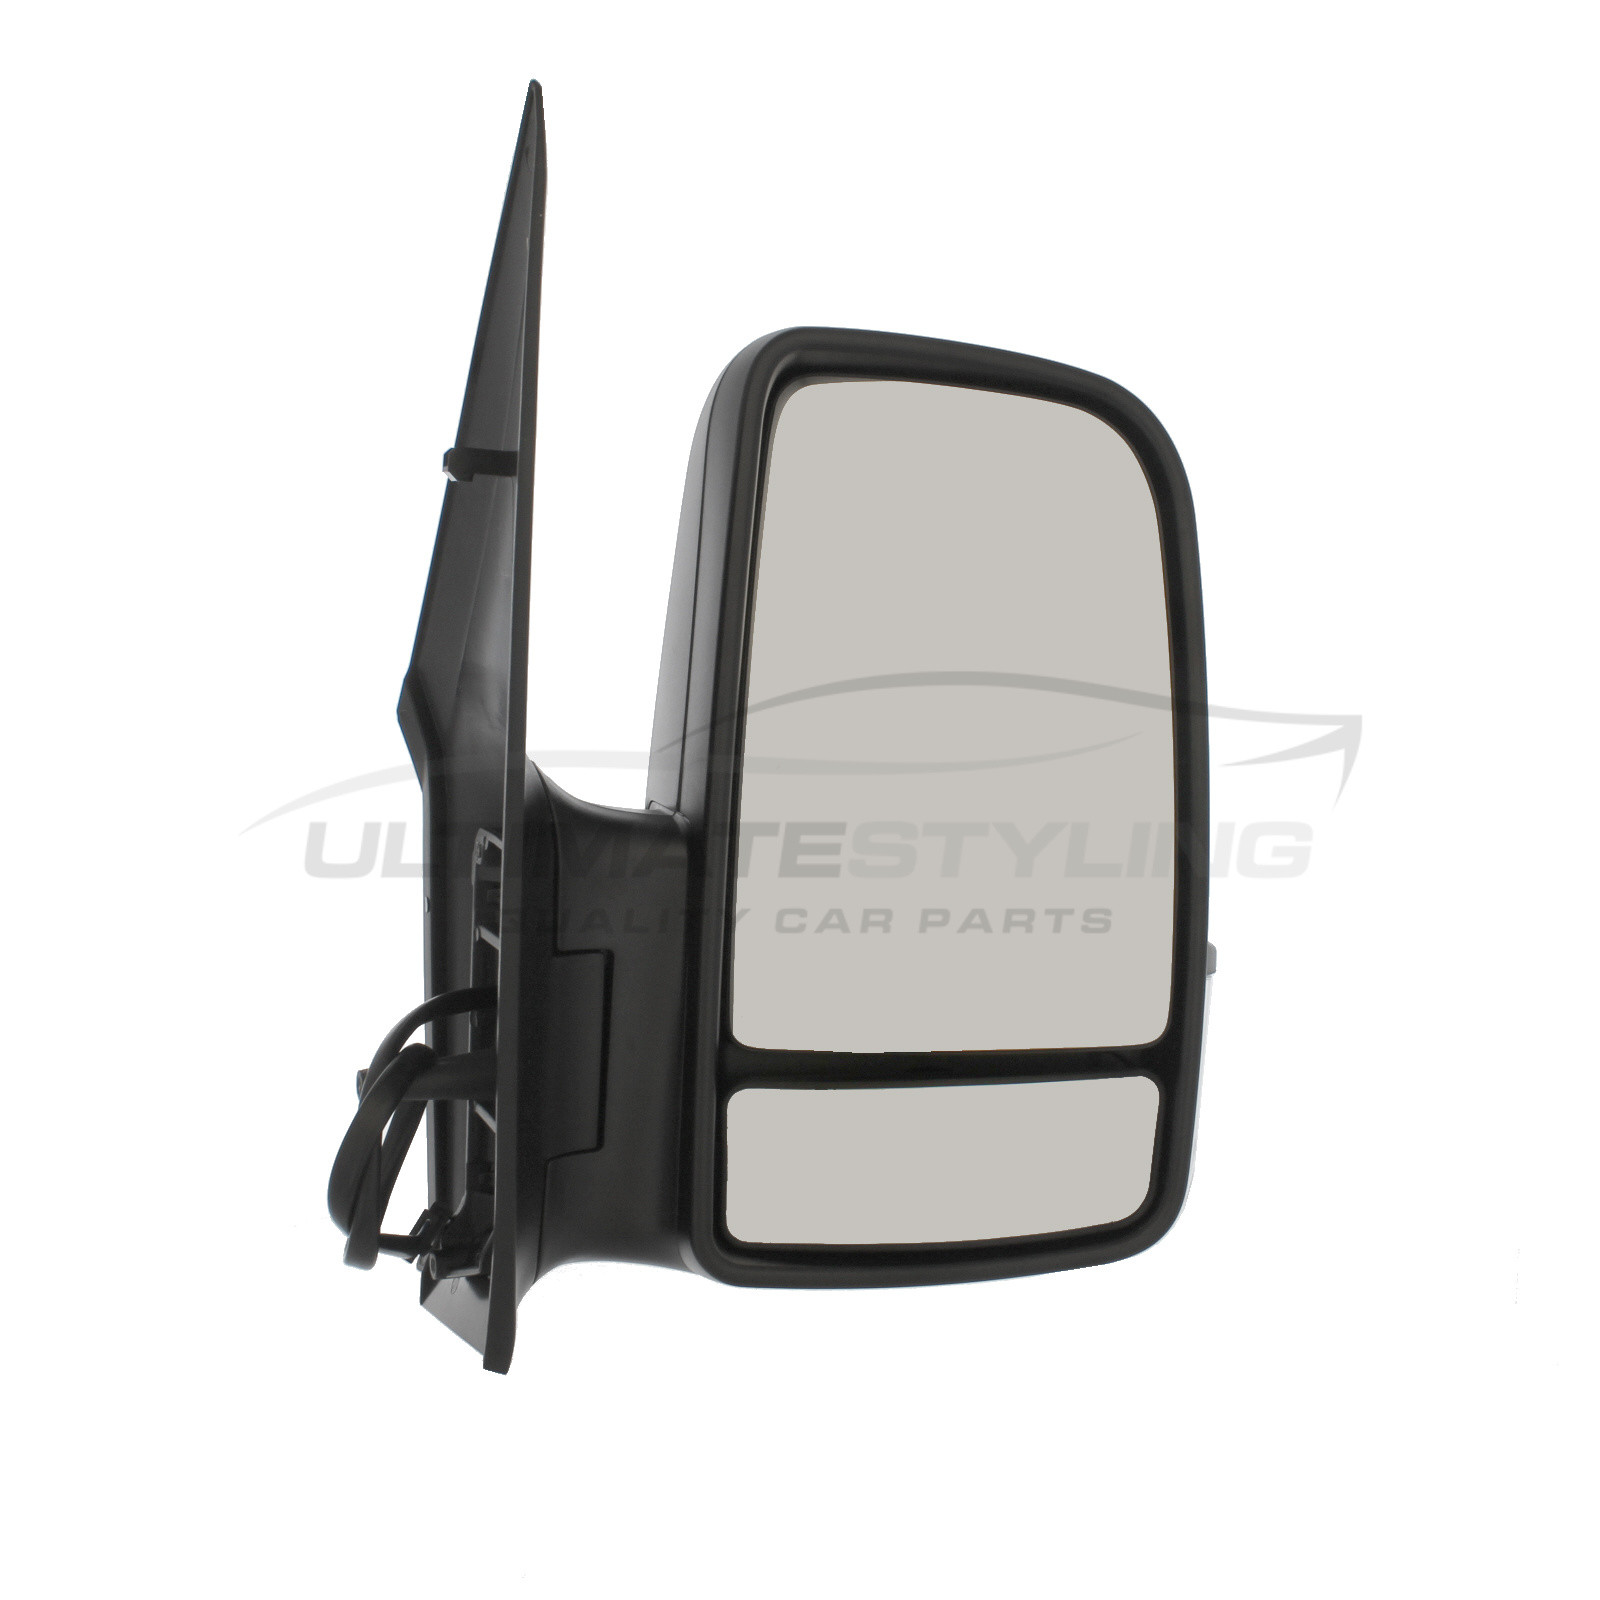 Mercedes Sprinter 2013 Door Mirror Cover Black LH Left Passengers Nearside